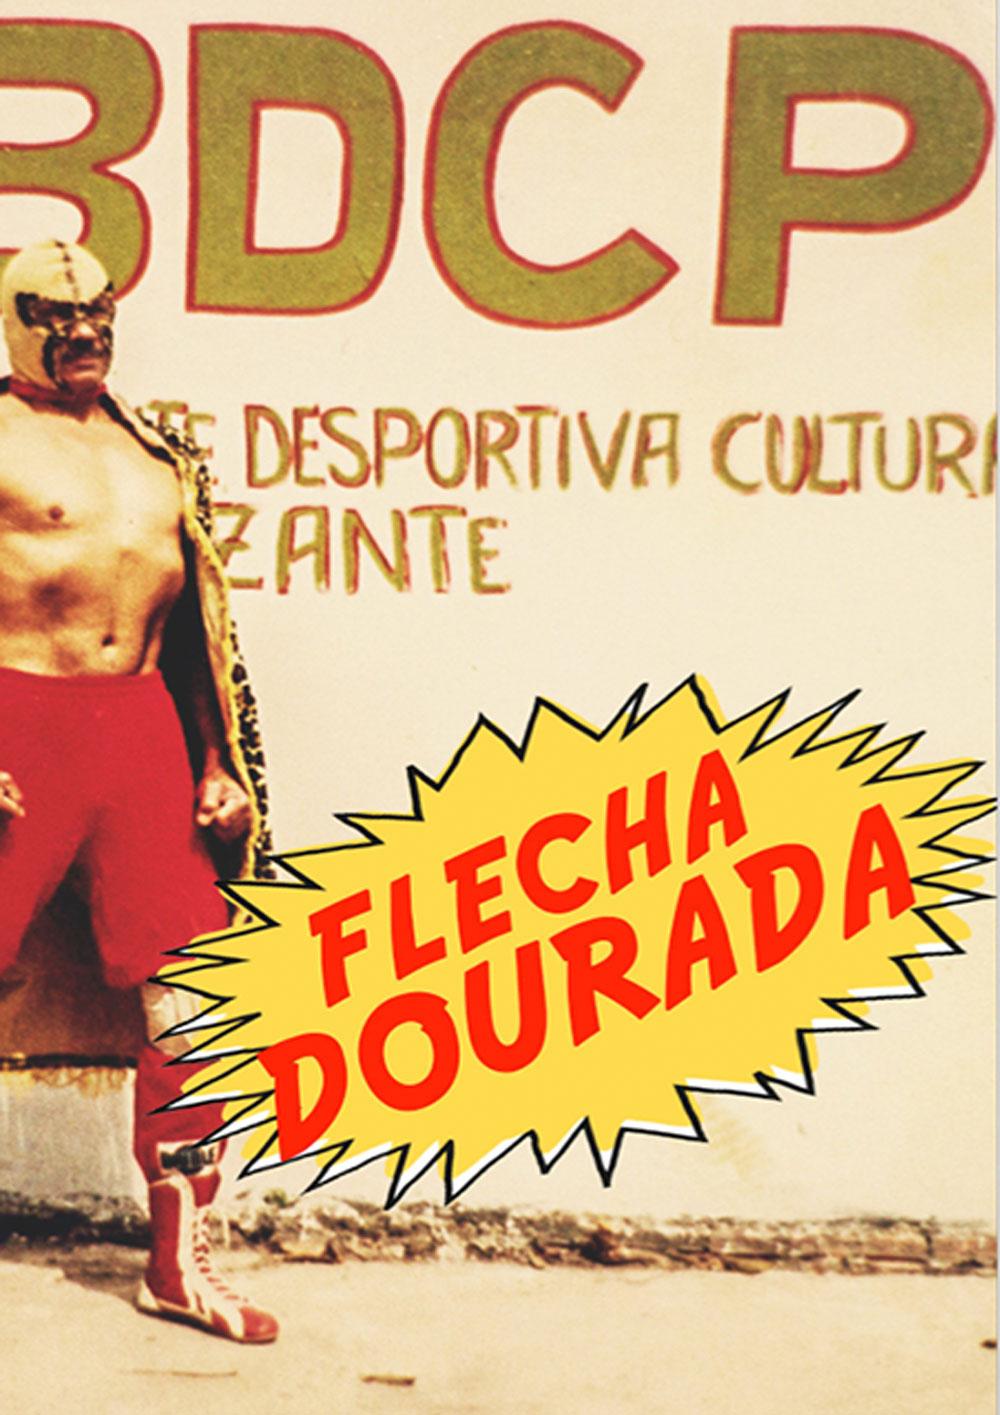 CURTA | DOC